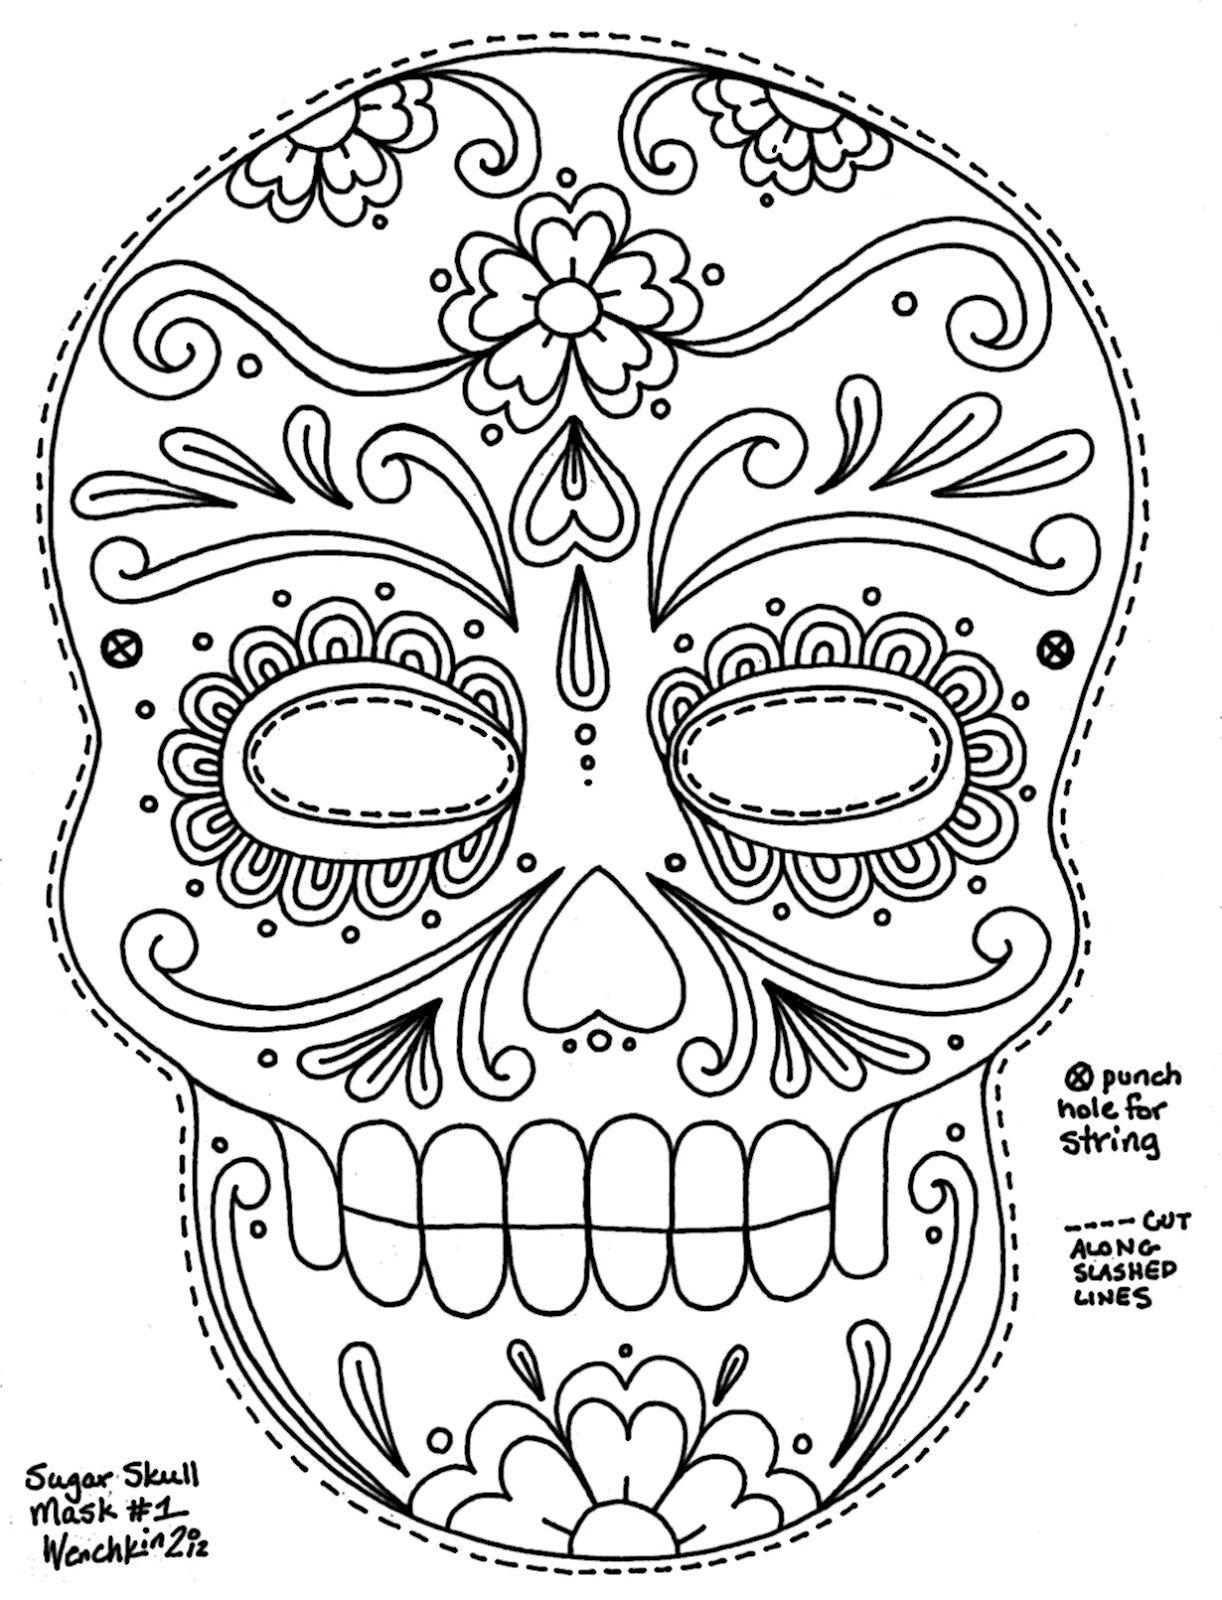 Free Printable Character Face Masks – Free Printable Face Masks